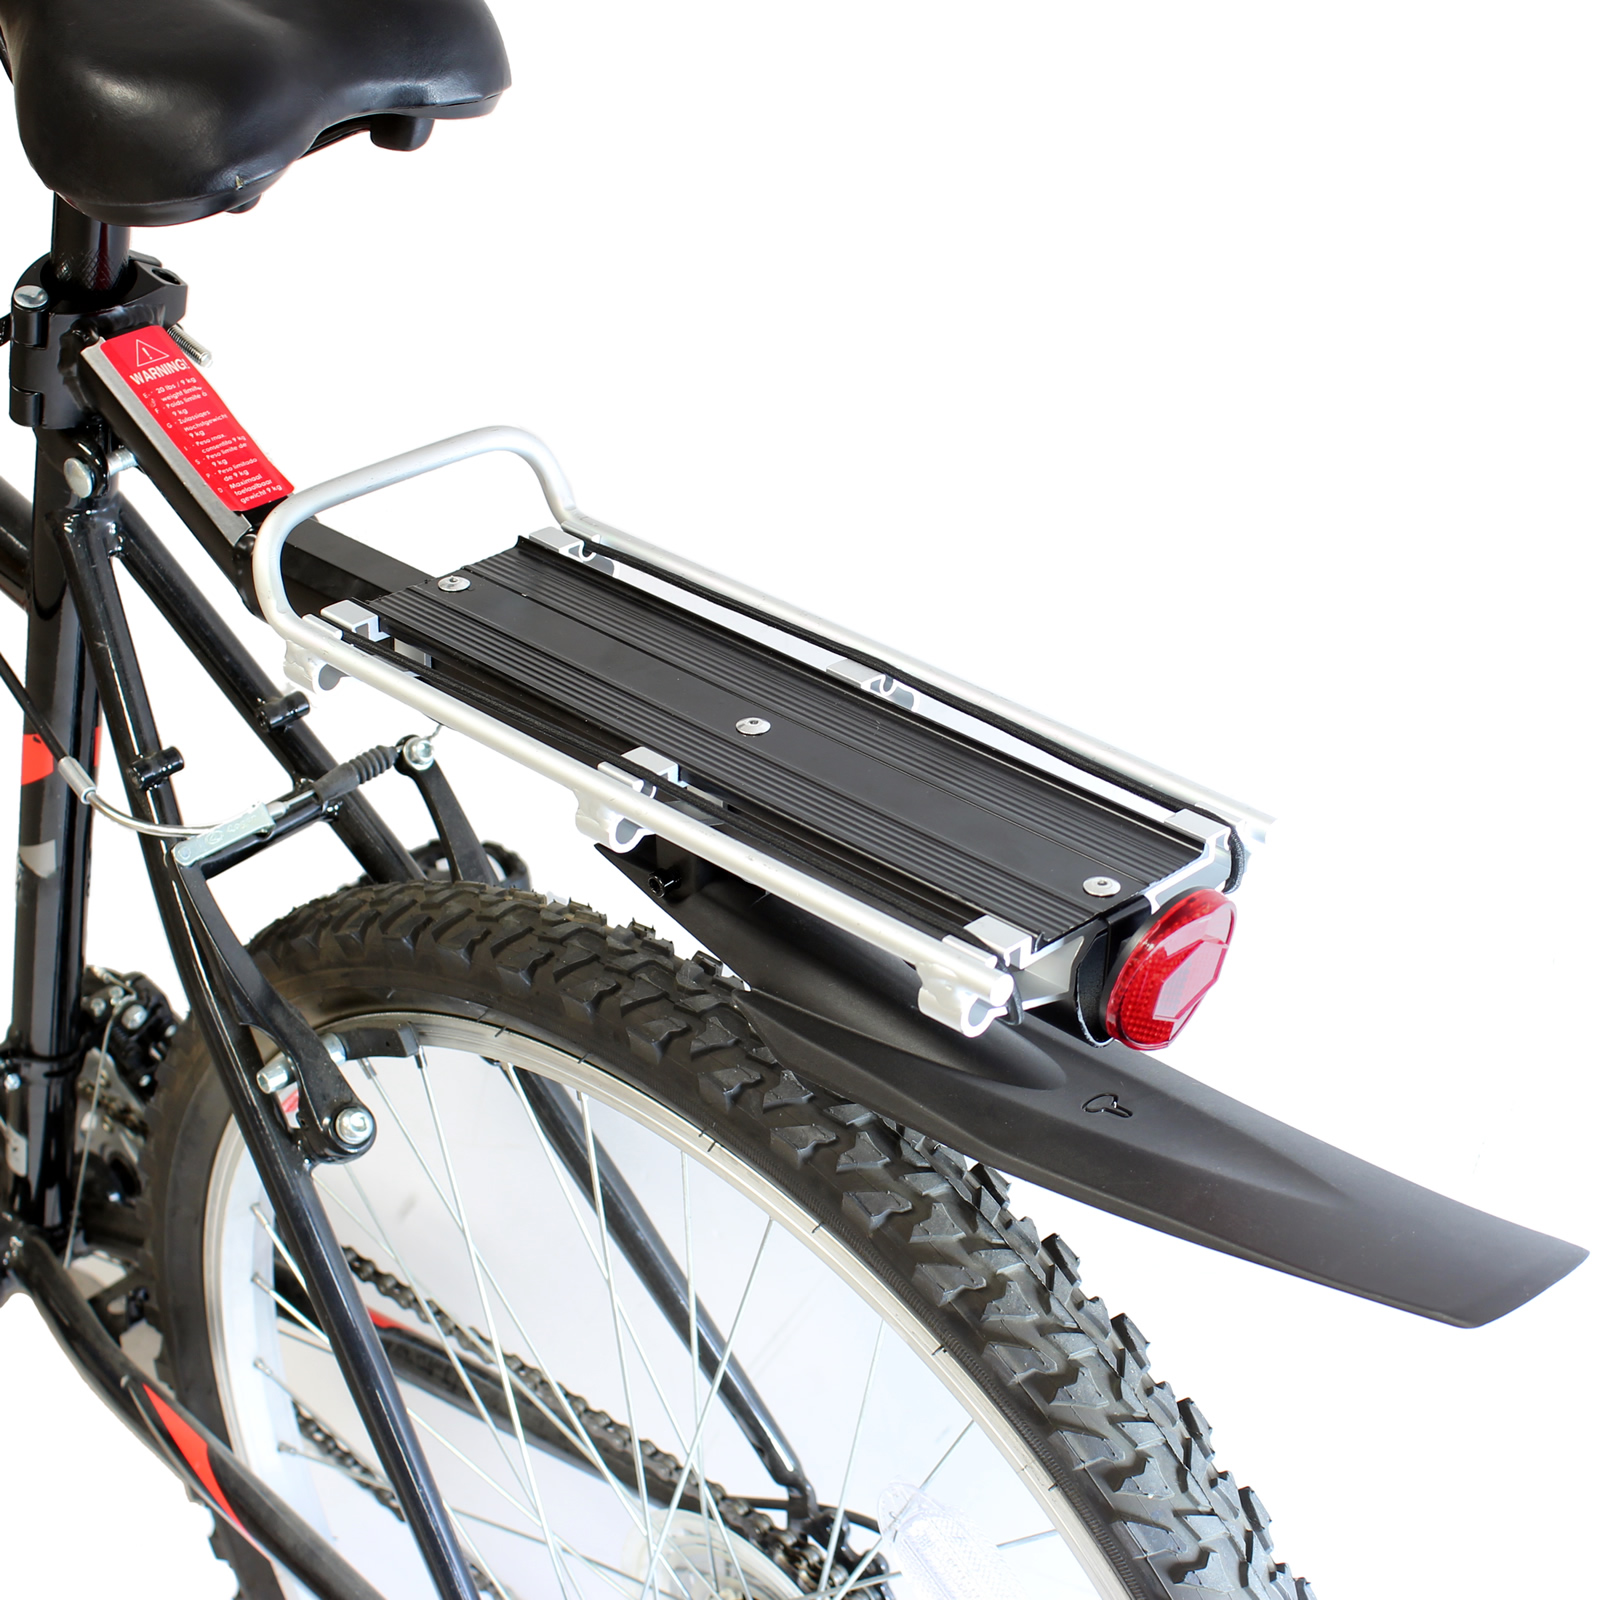 pedalpro fahrrad gep cktr ger mit schutzblech aluminium silber u schwarz ebay. Black Bedroom Furniture Sets. Home Design Ideas